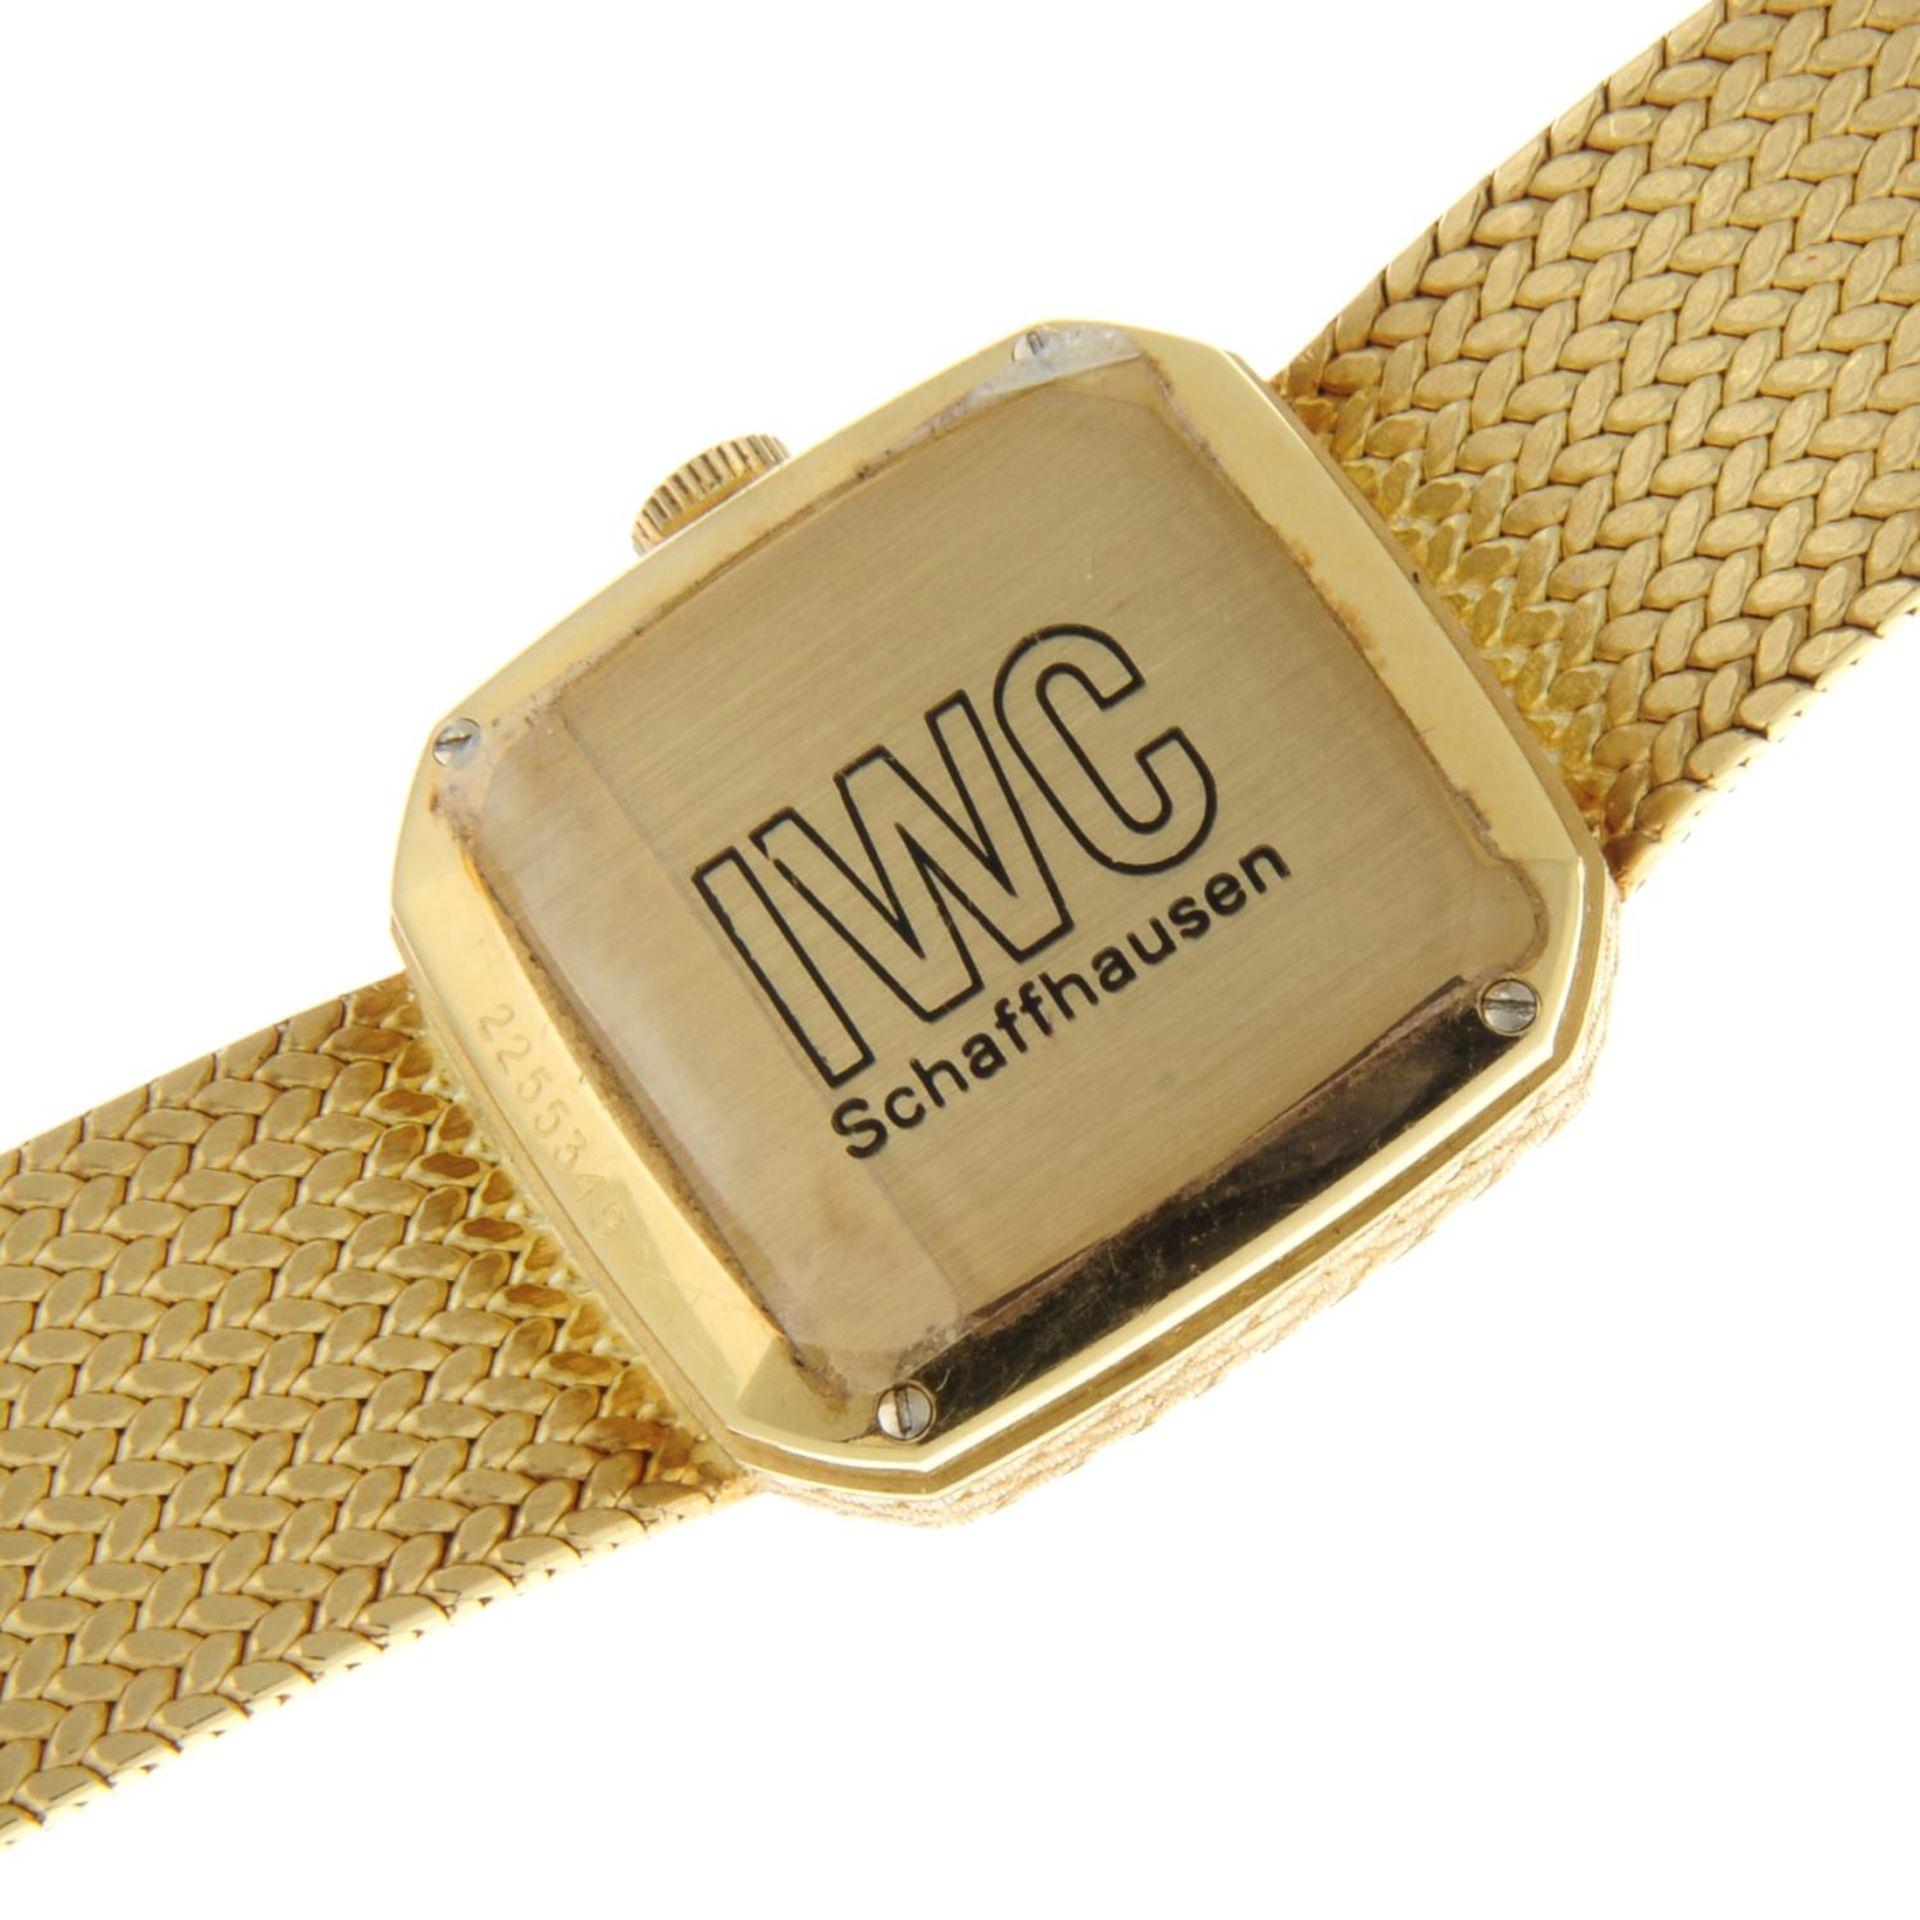 IWC - a bracelet watch. - Bild 5 aus 5